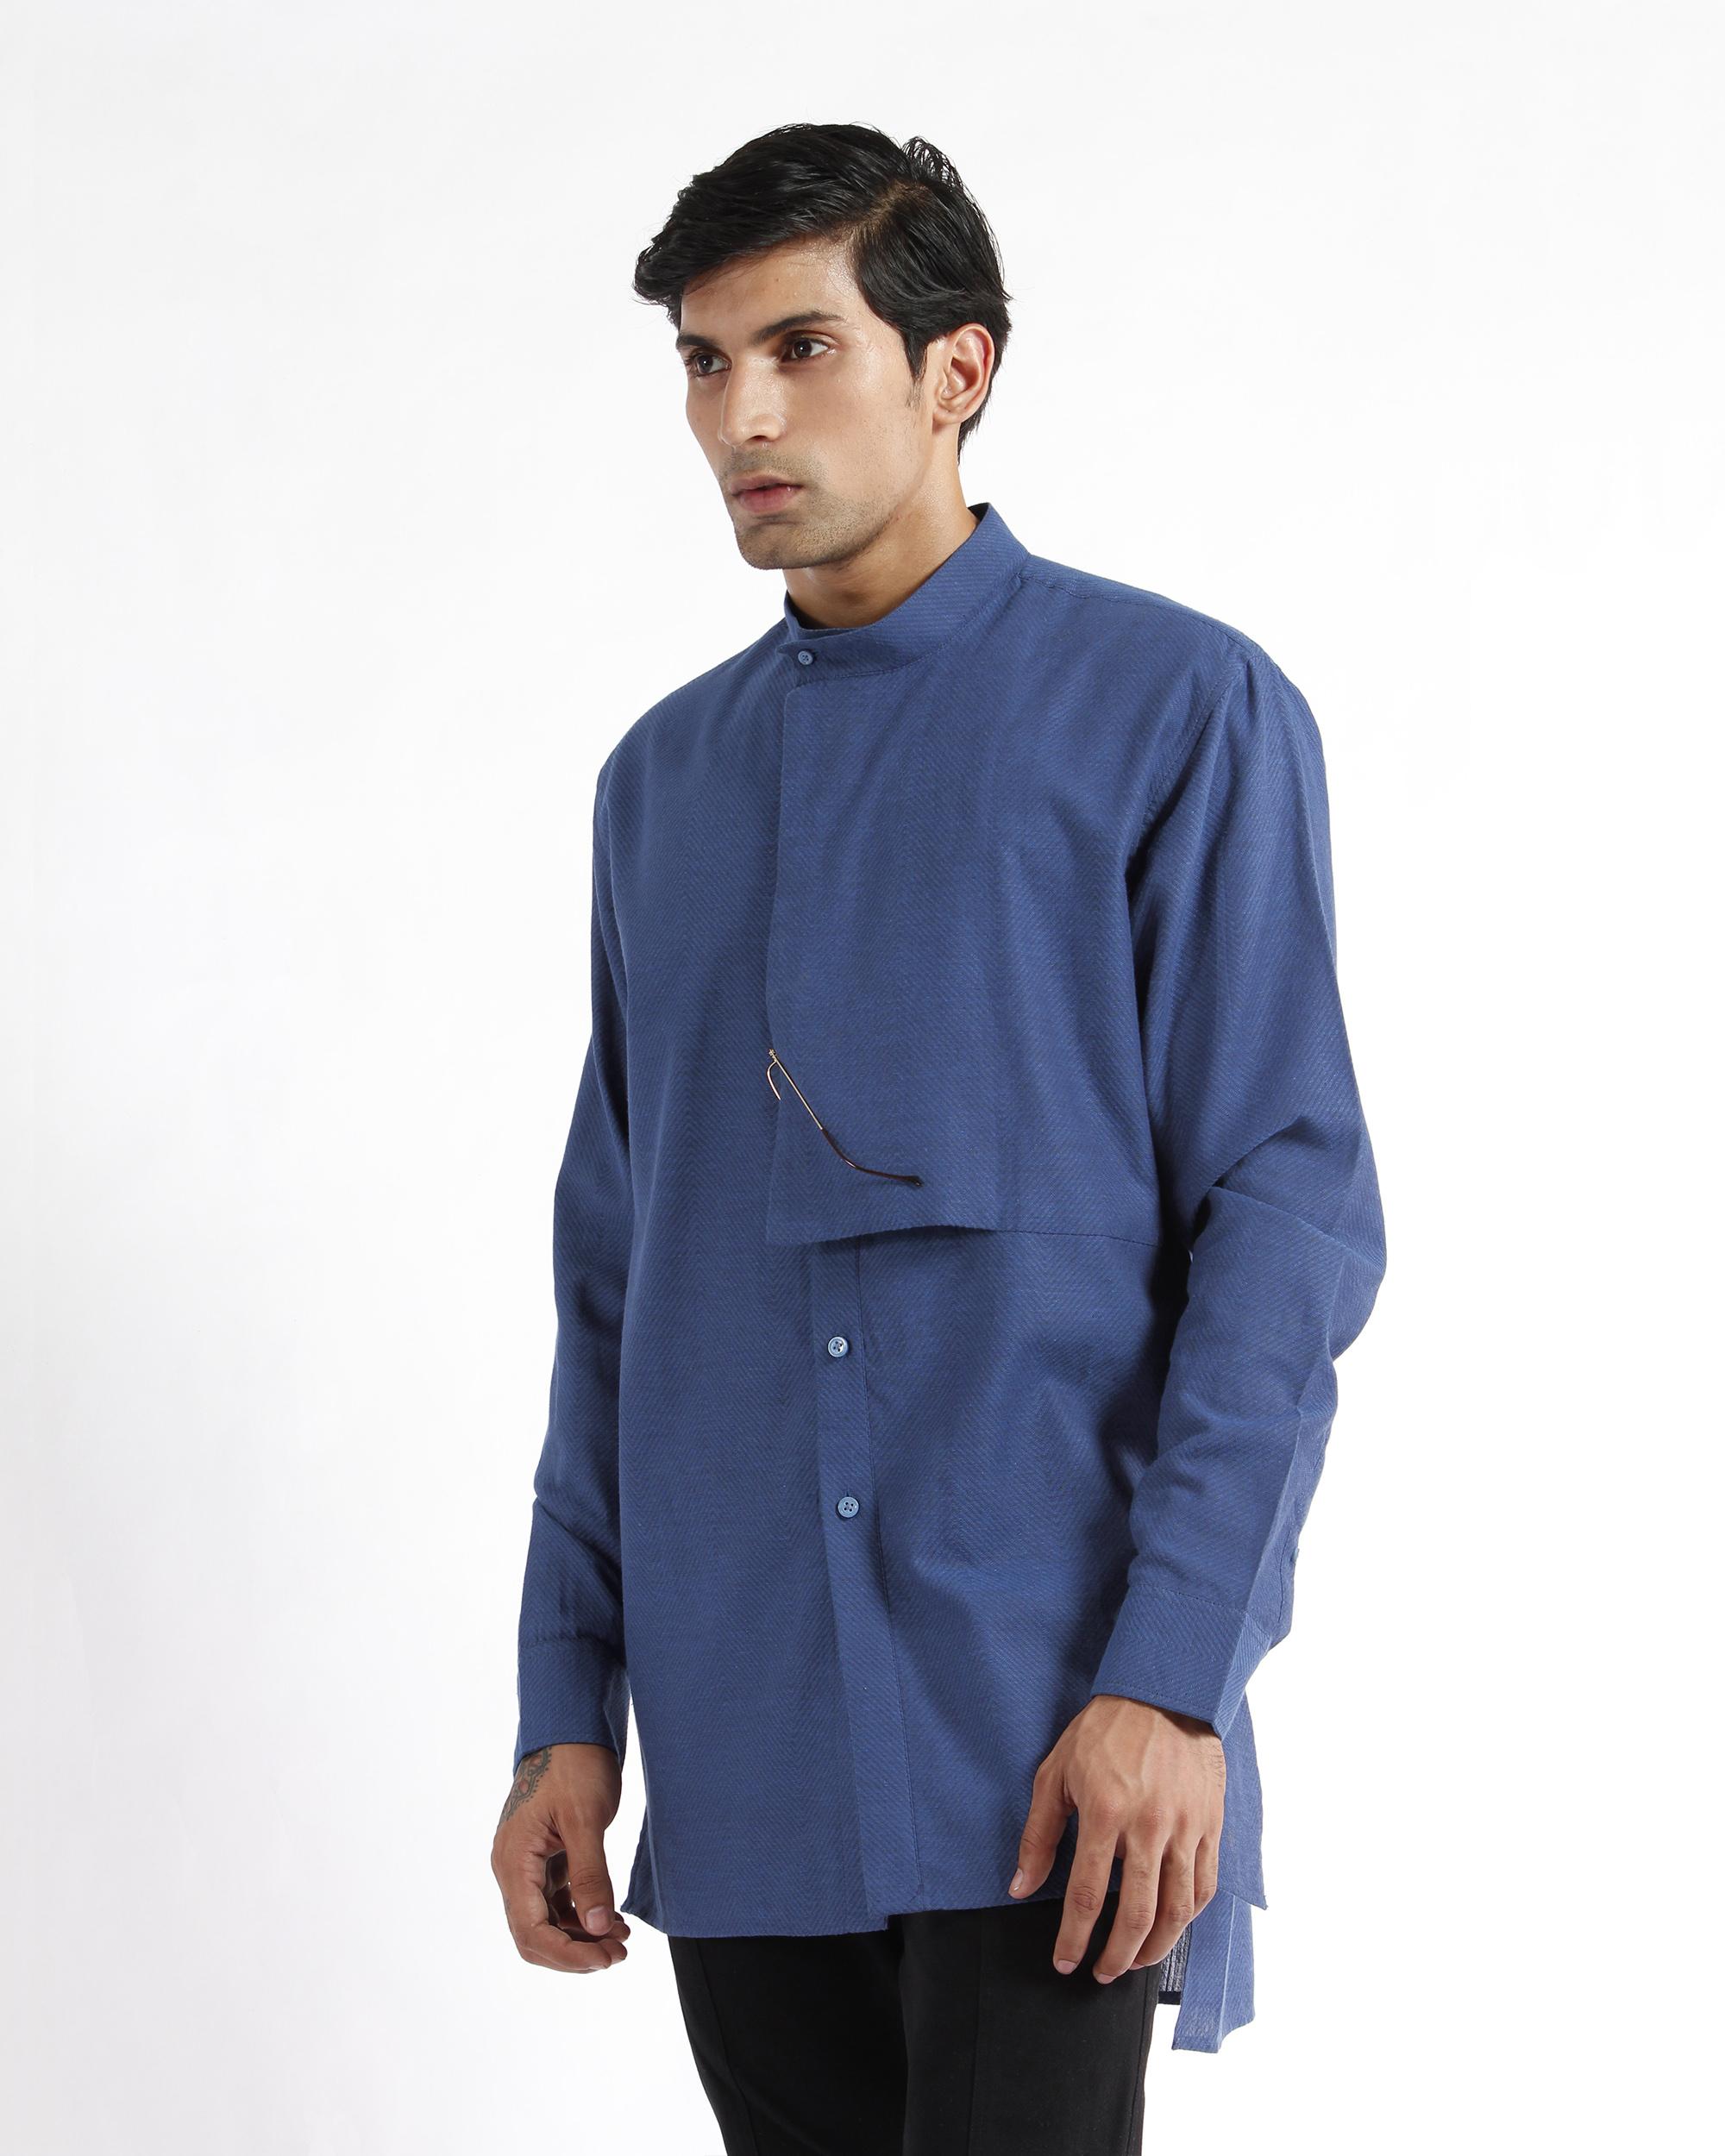 Indigo handwoven chevron cotton tunic shirt